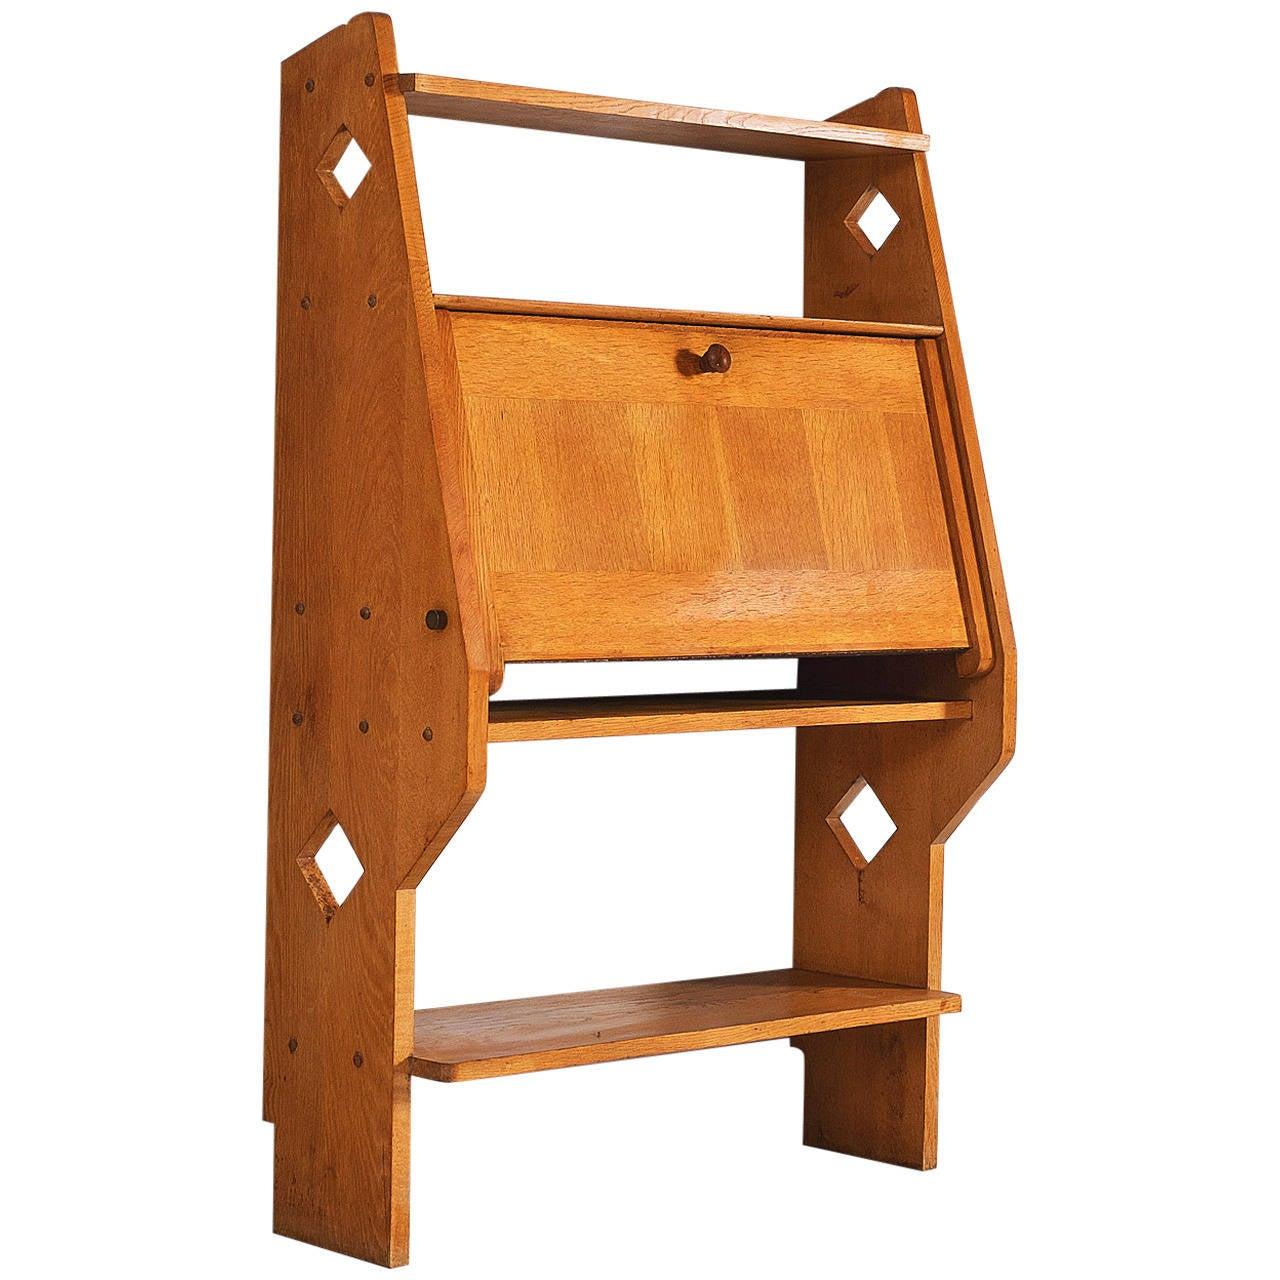 guillerme et chambron french solid oak secretary at 1stdibs. Black Bedroom Furniture Sets. Home Design Ideas